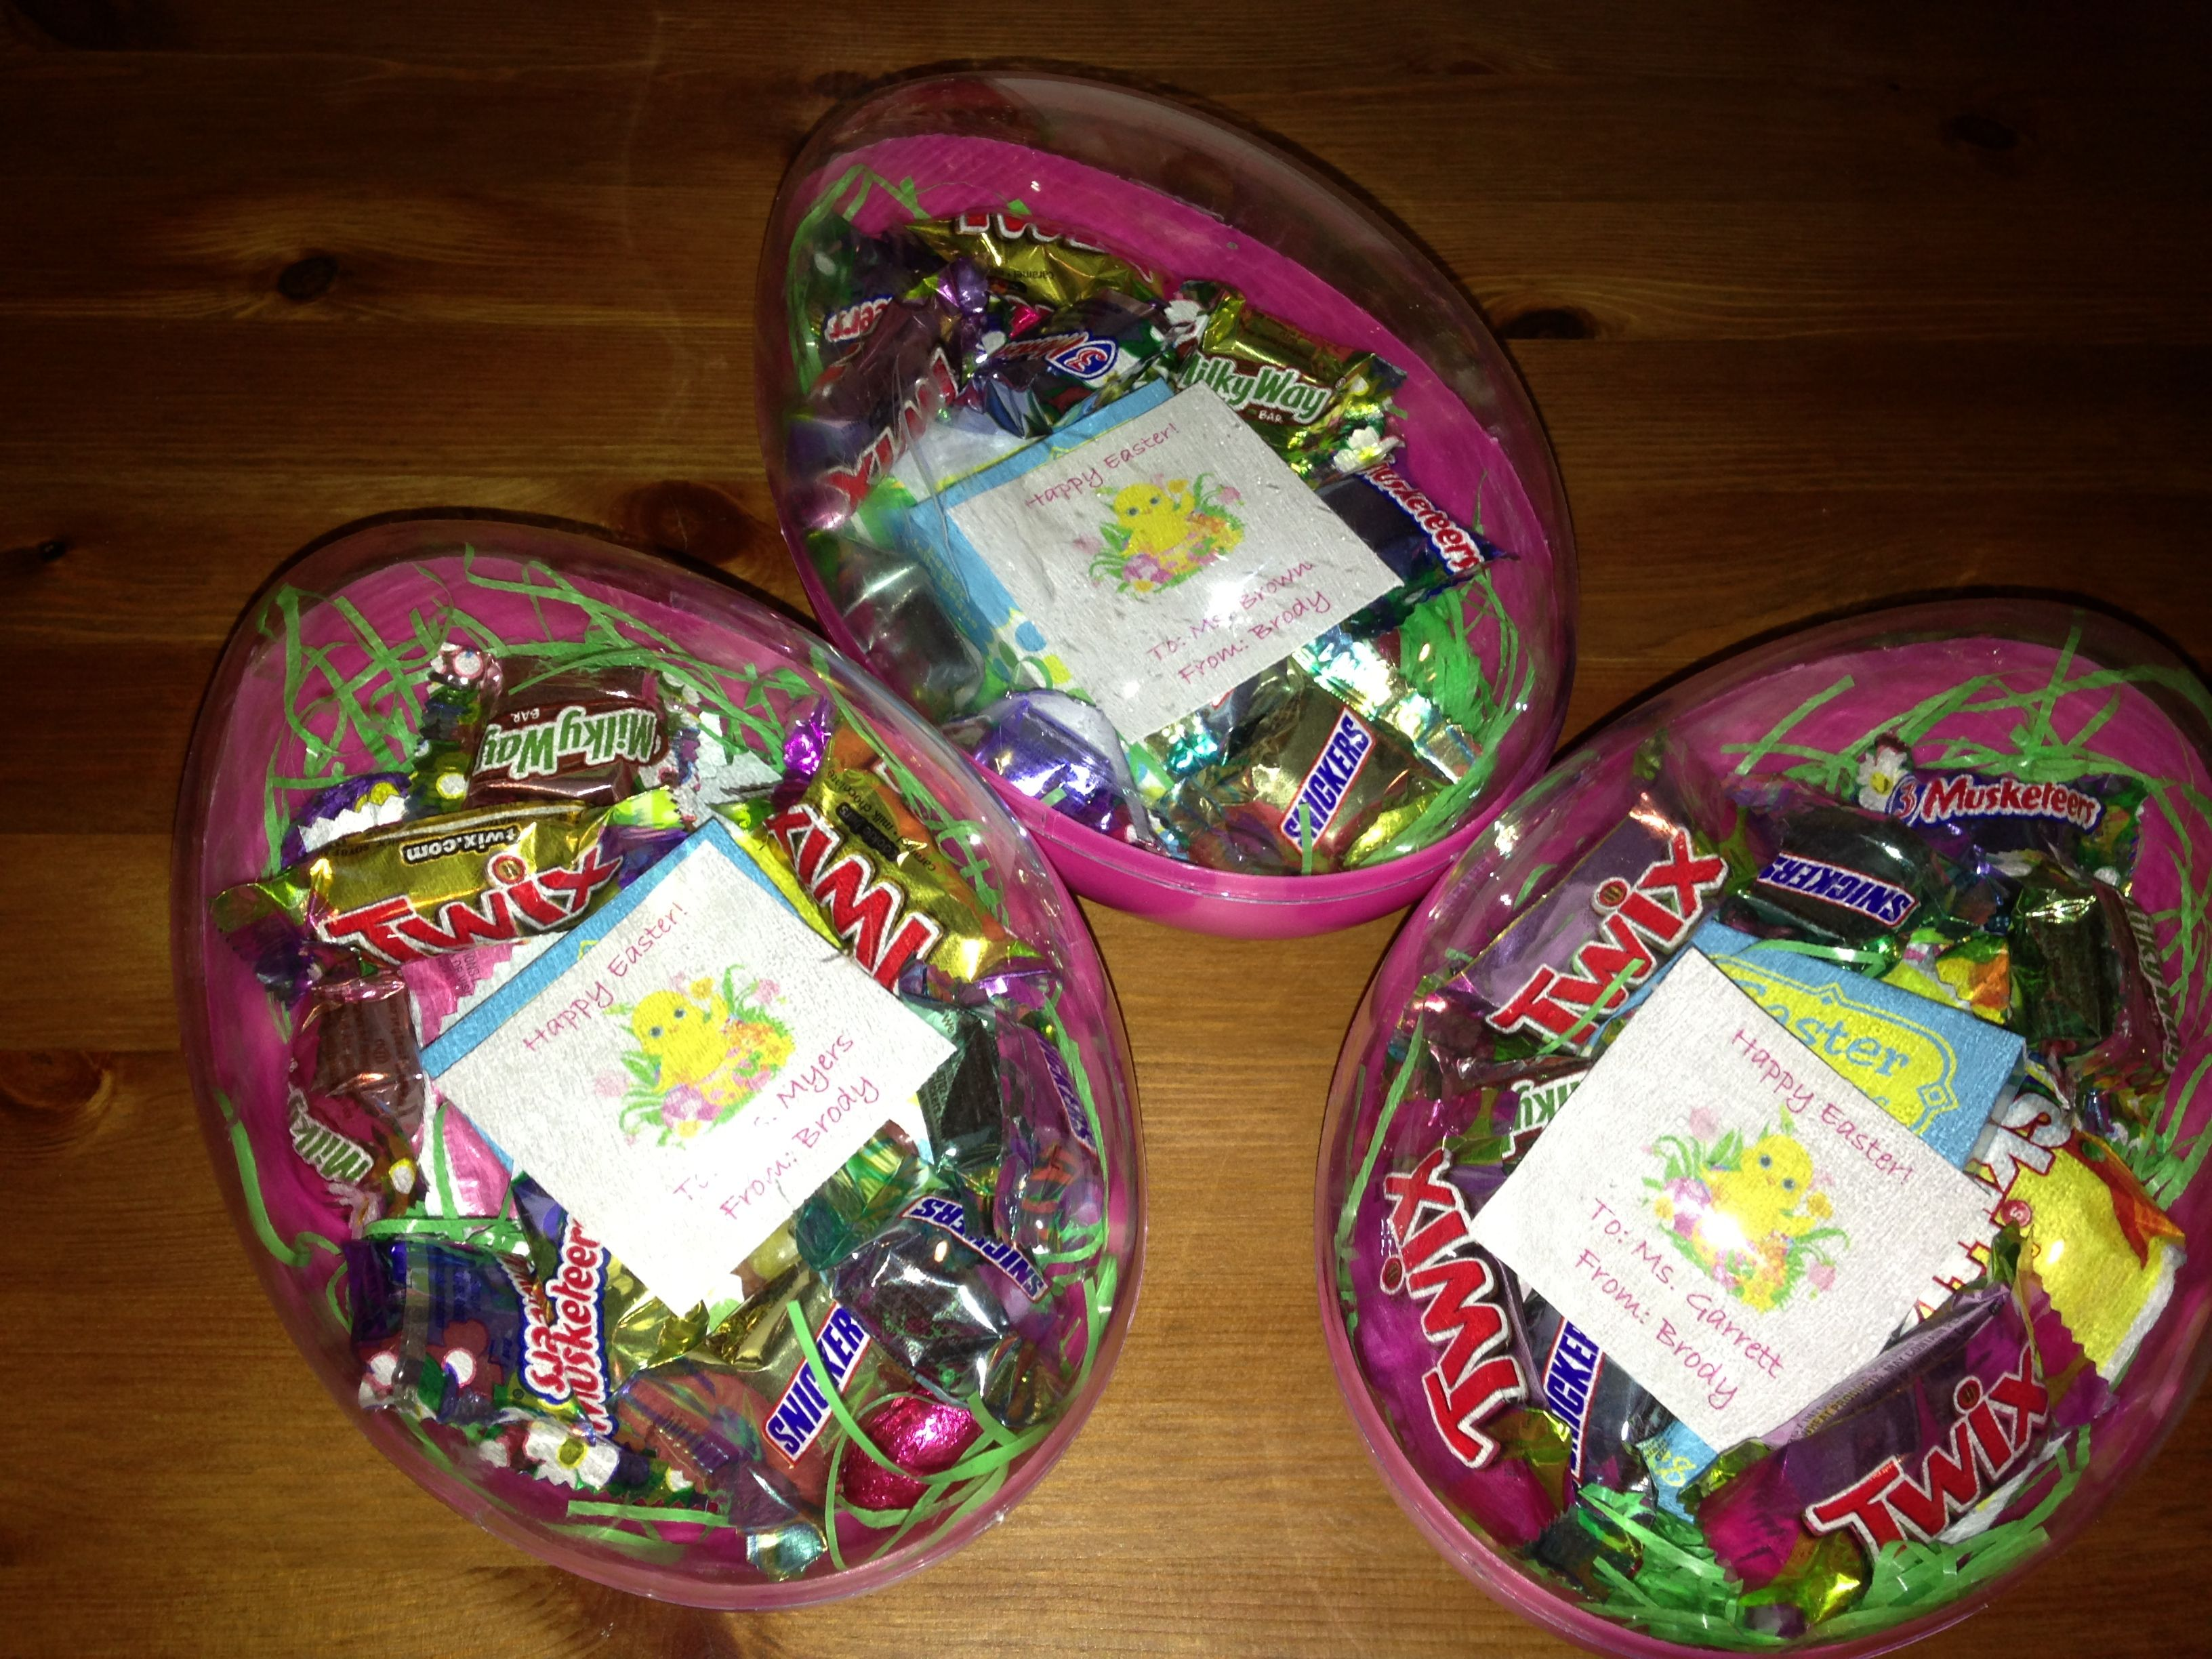 Easter gifts for teachers plastic eggs filled with candy my easter gifts for teachers plastic eggs filled with candy negle Images